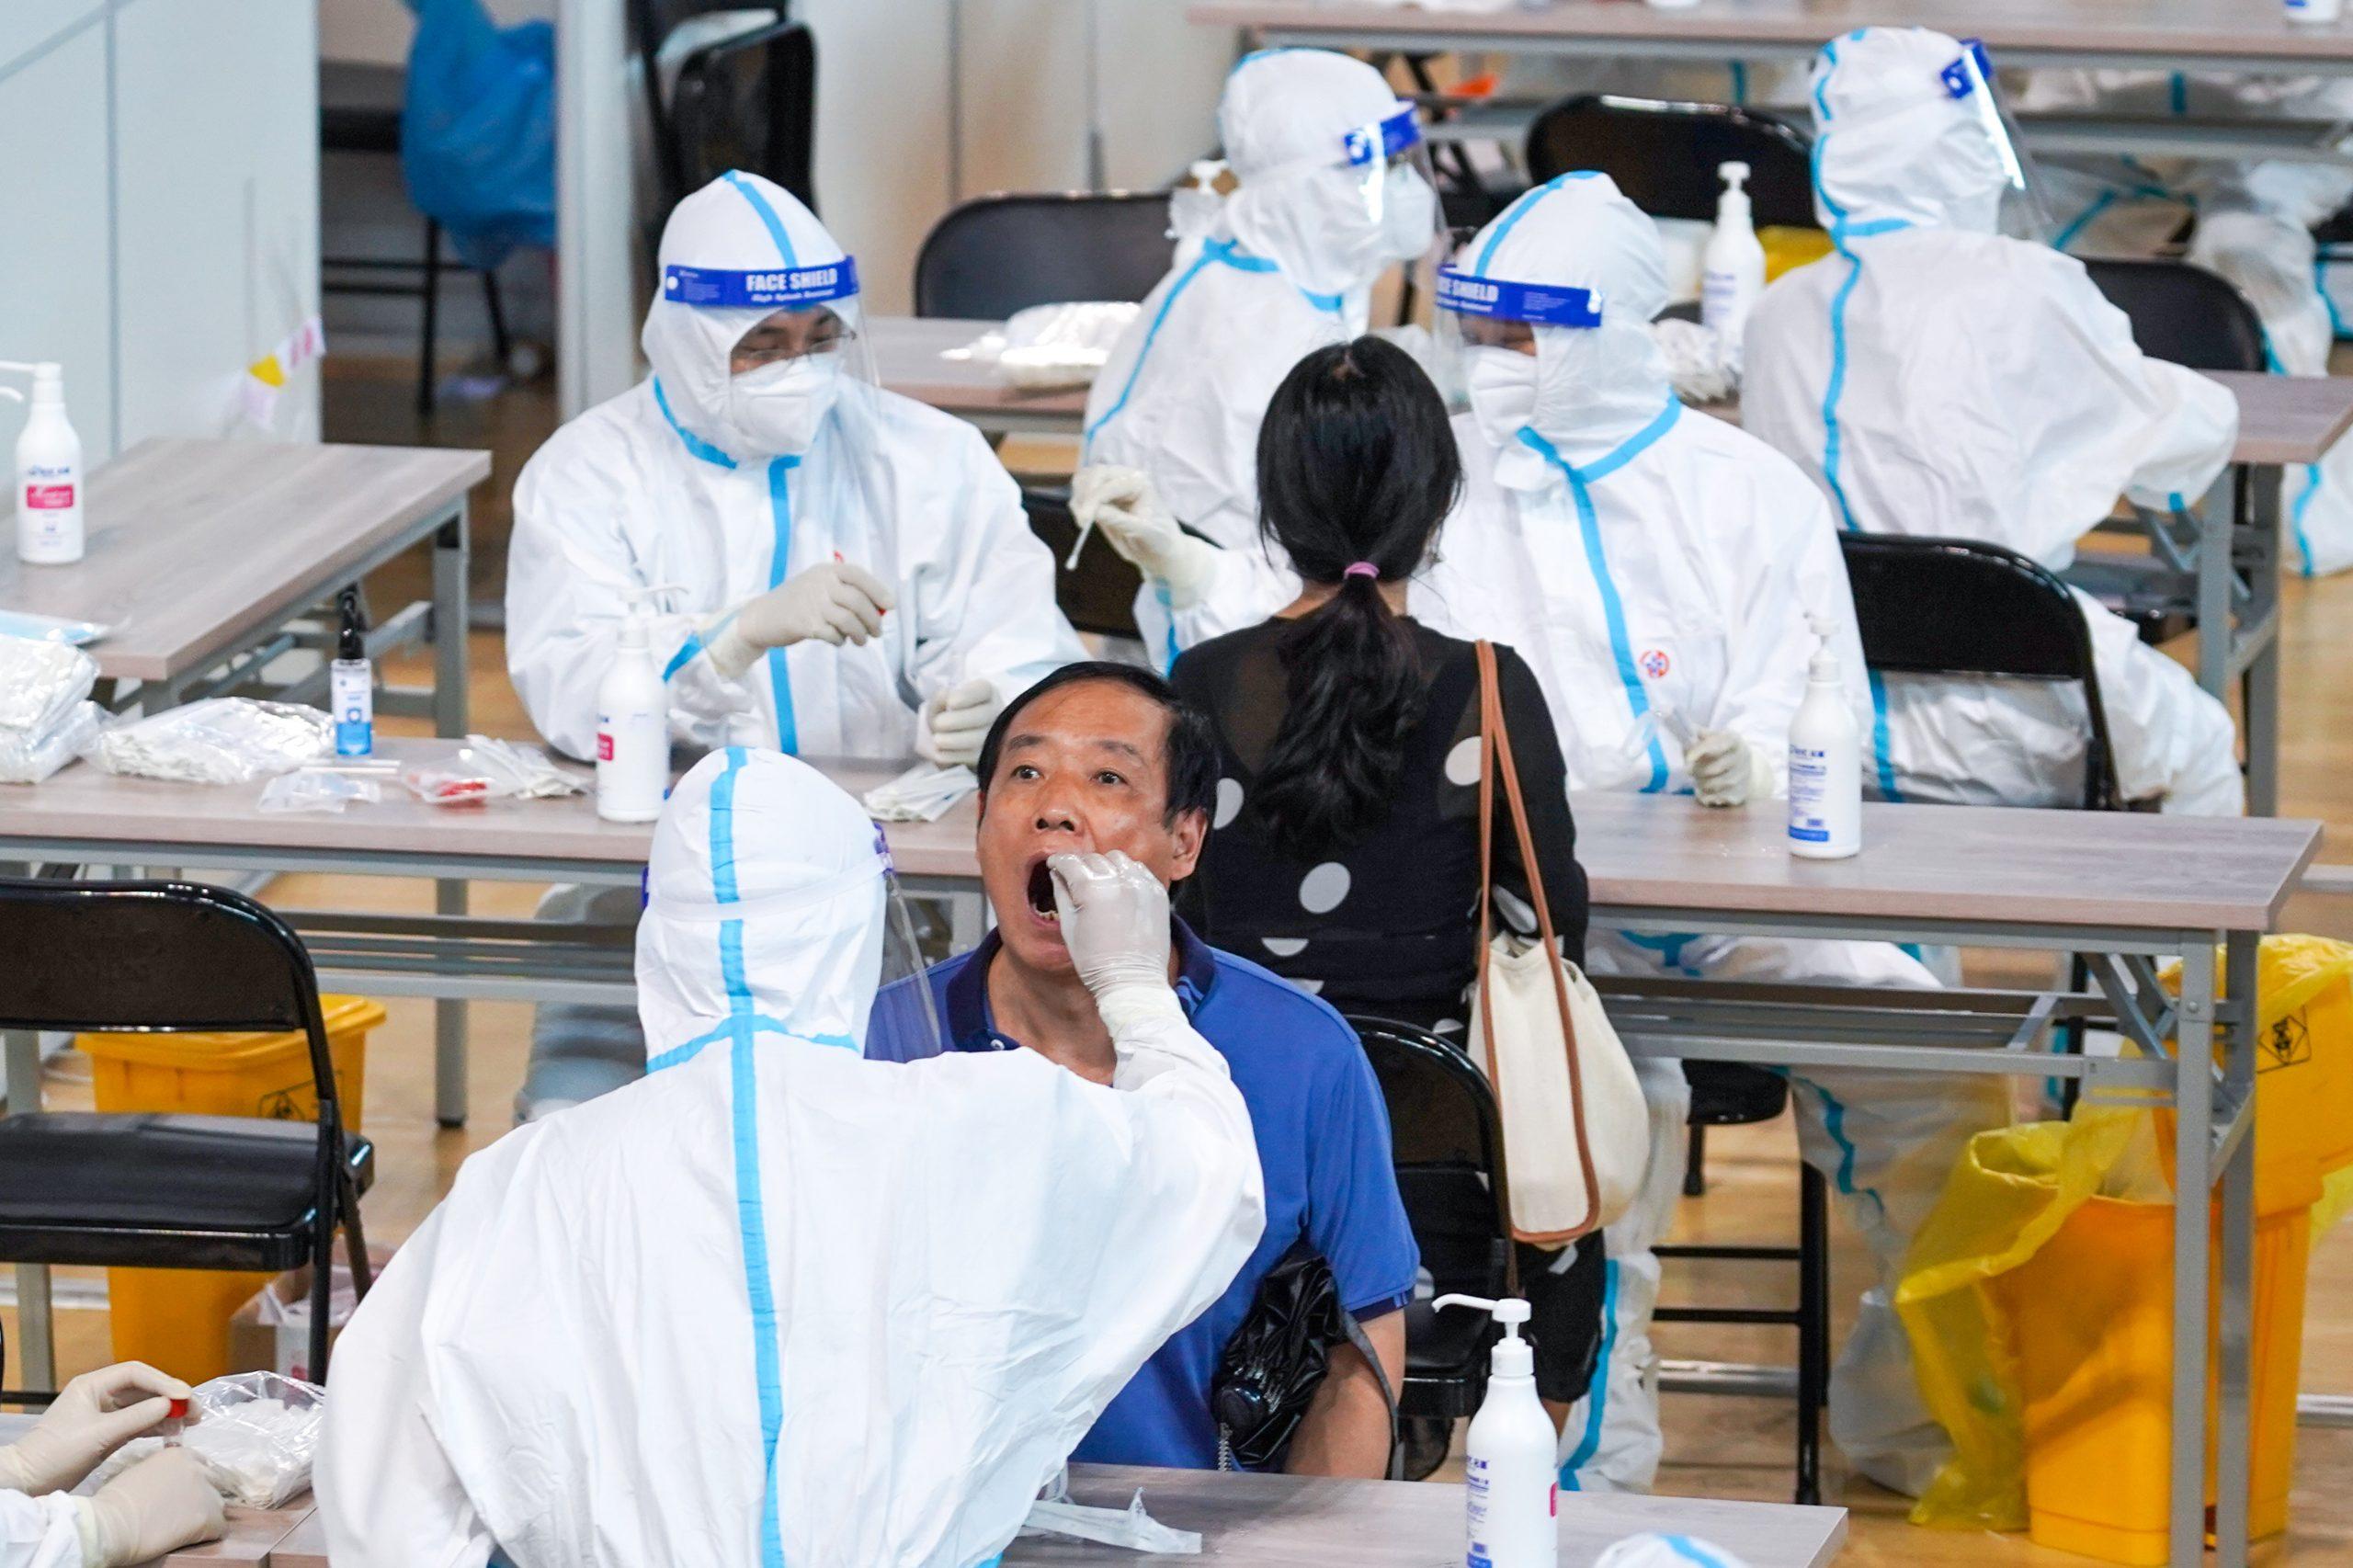 Diecisiete provincias chinas informan casos de COVID-19 de transmisión local o asintomáticos